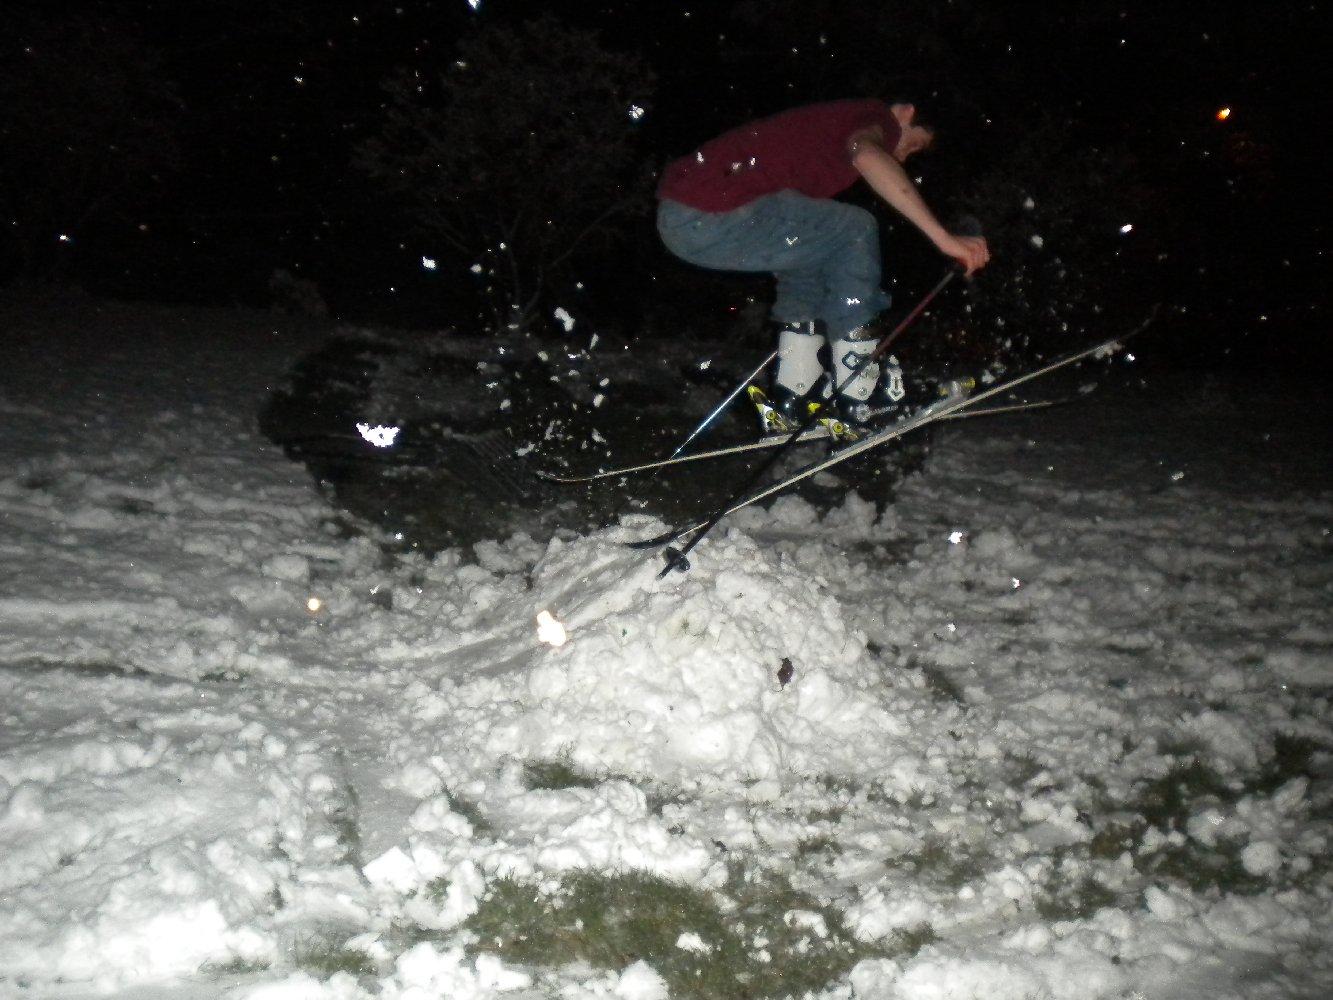 Backyard Skiing on April 18th - 21 of 27